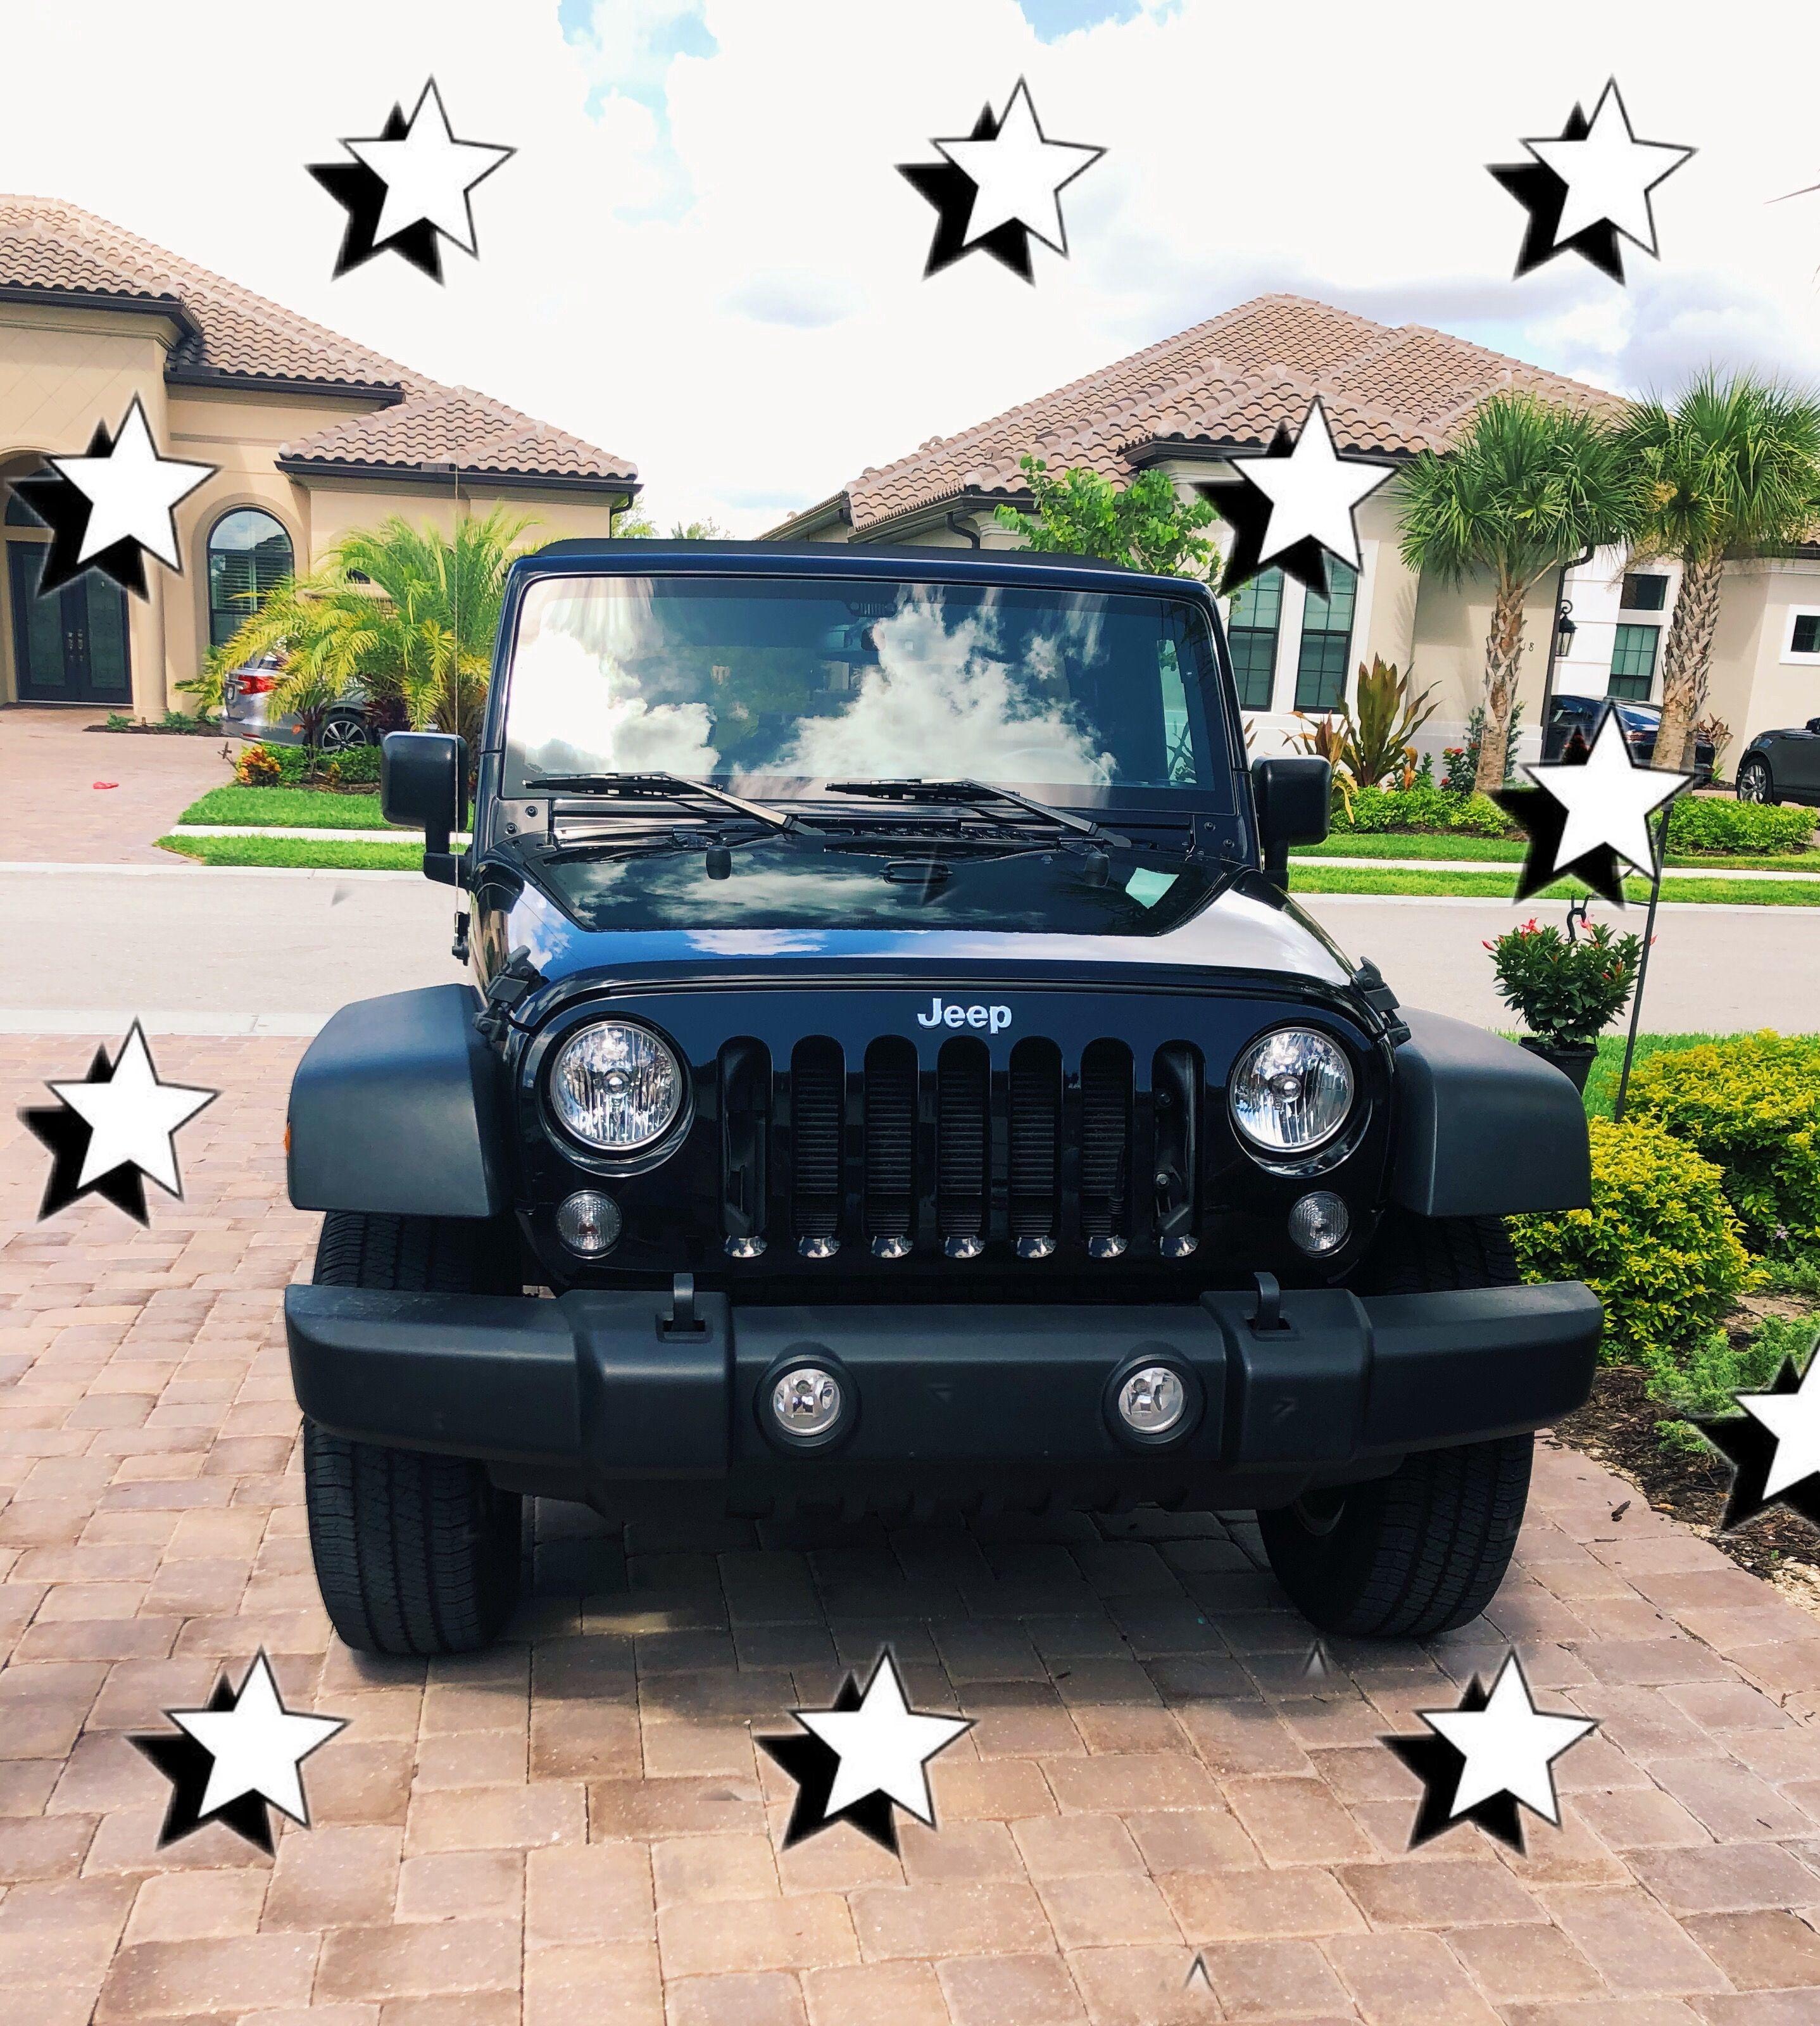 Pin By Tori On My Car Ahhh Inspo Dream Cars Jeep Dream Cars